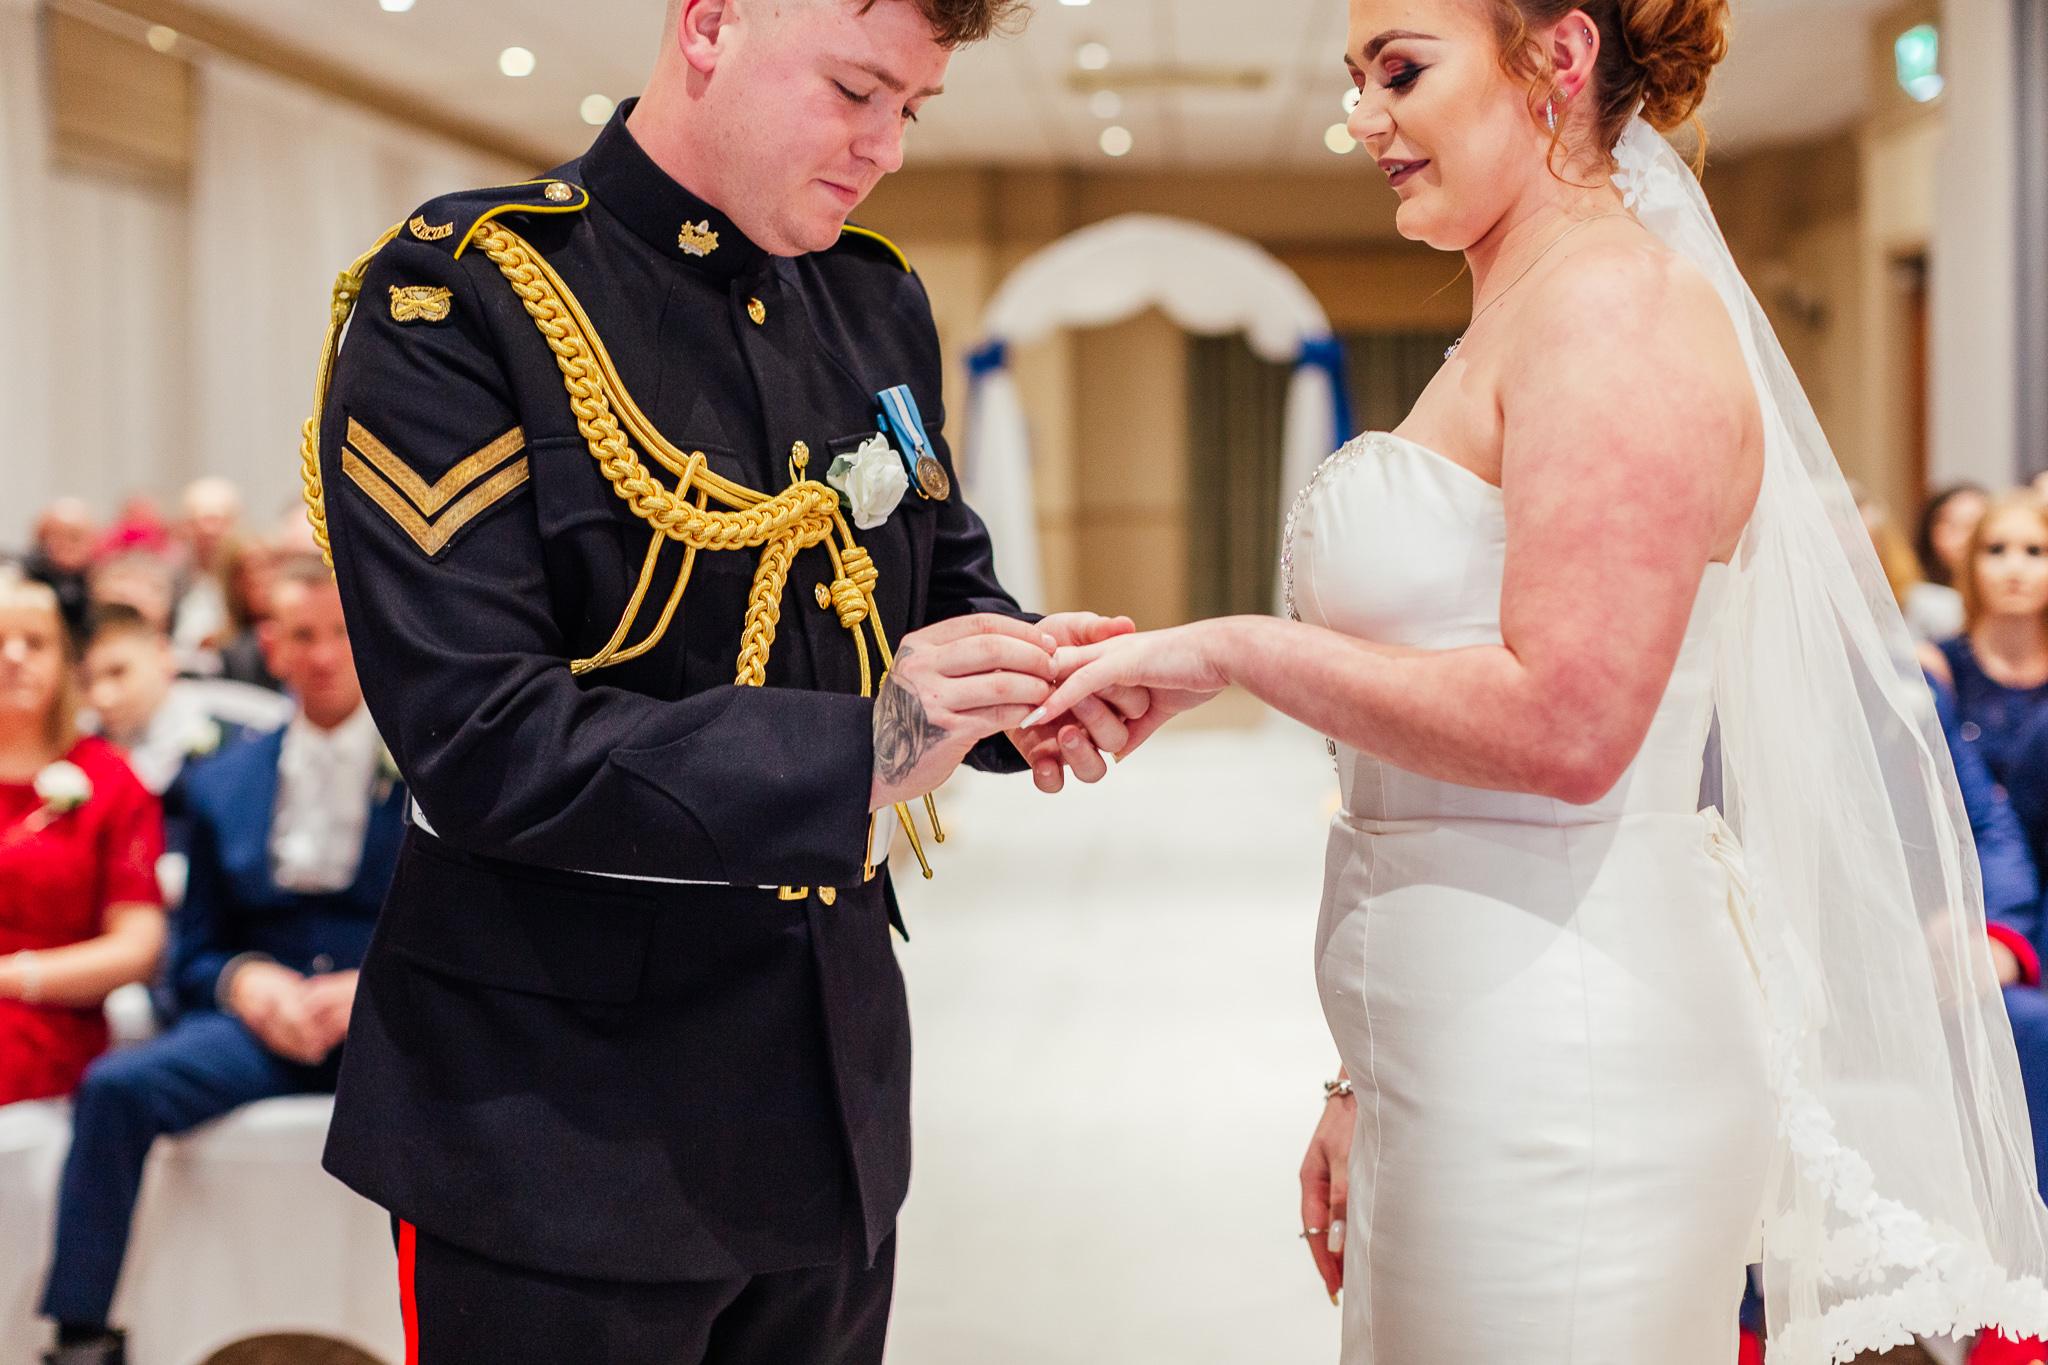 Mollingtonbanastre_wedding-10.jpg